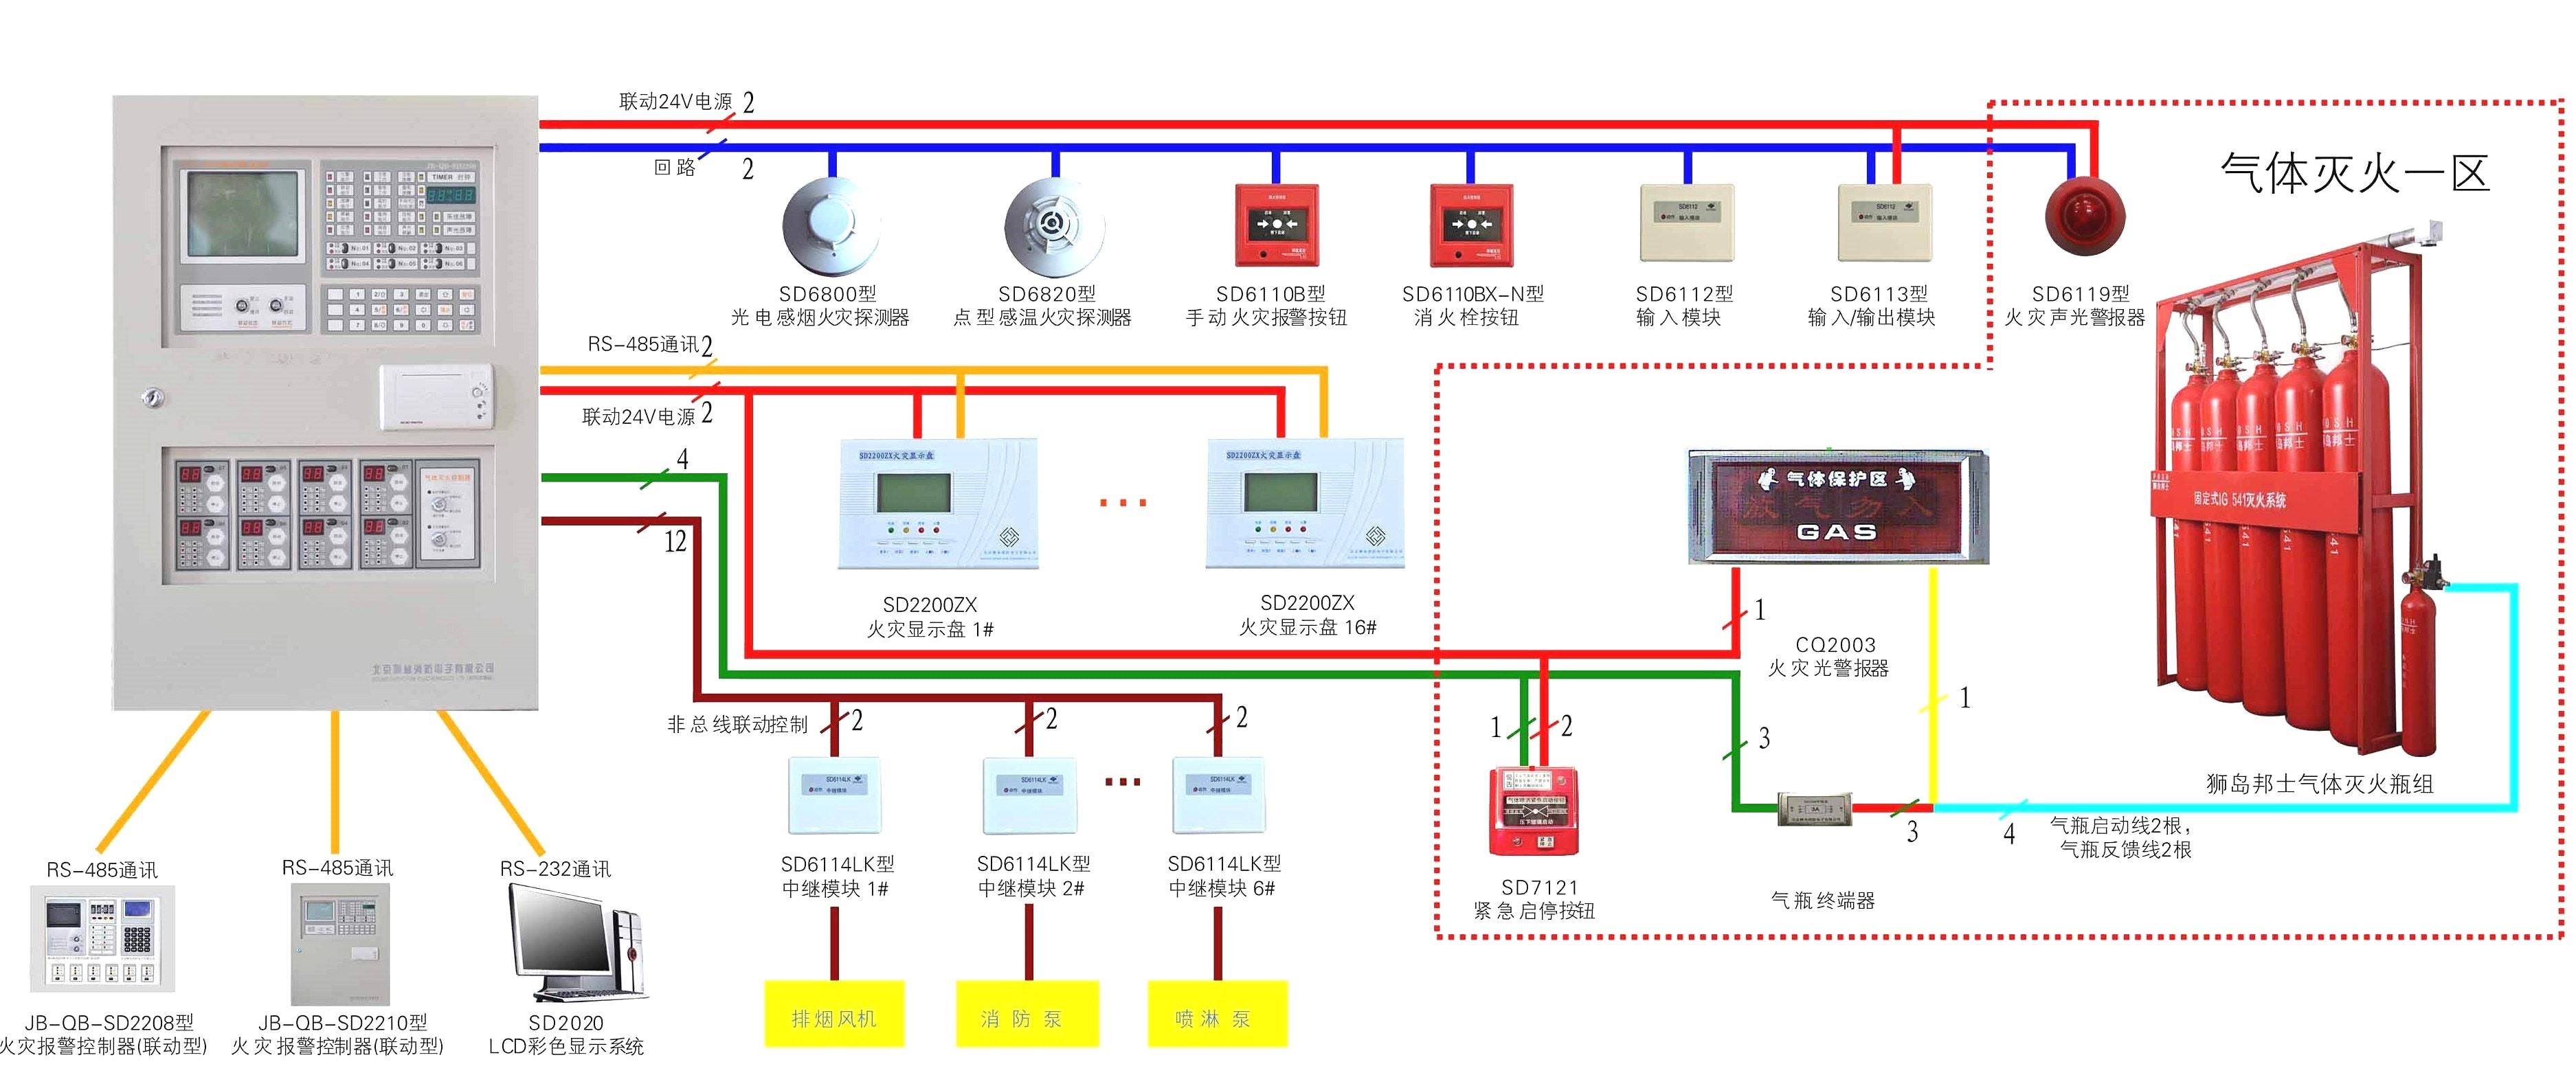 Honeywell Fire Alarm Wiring Diagram